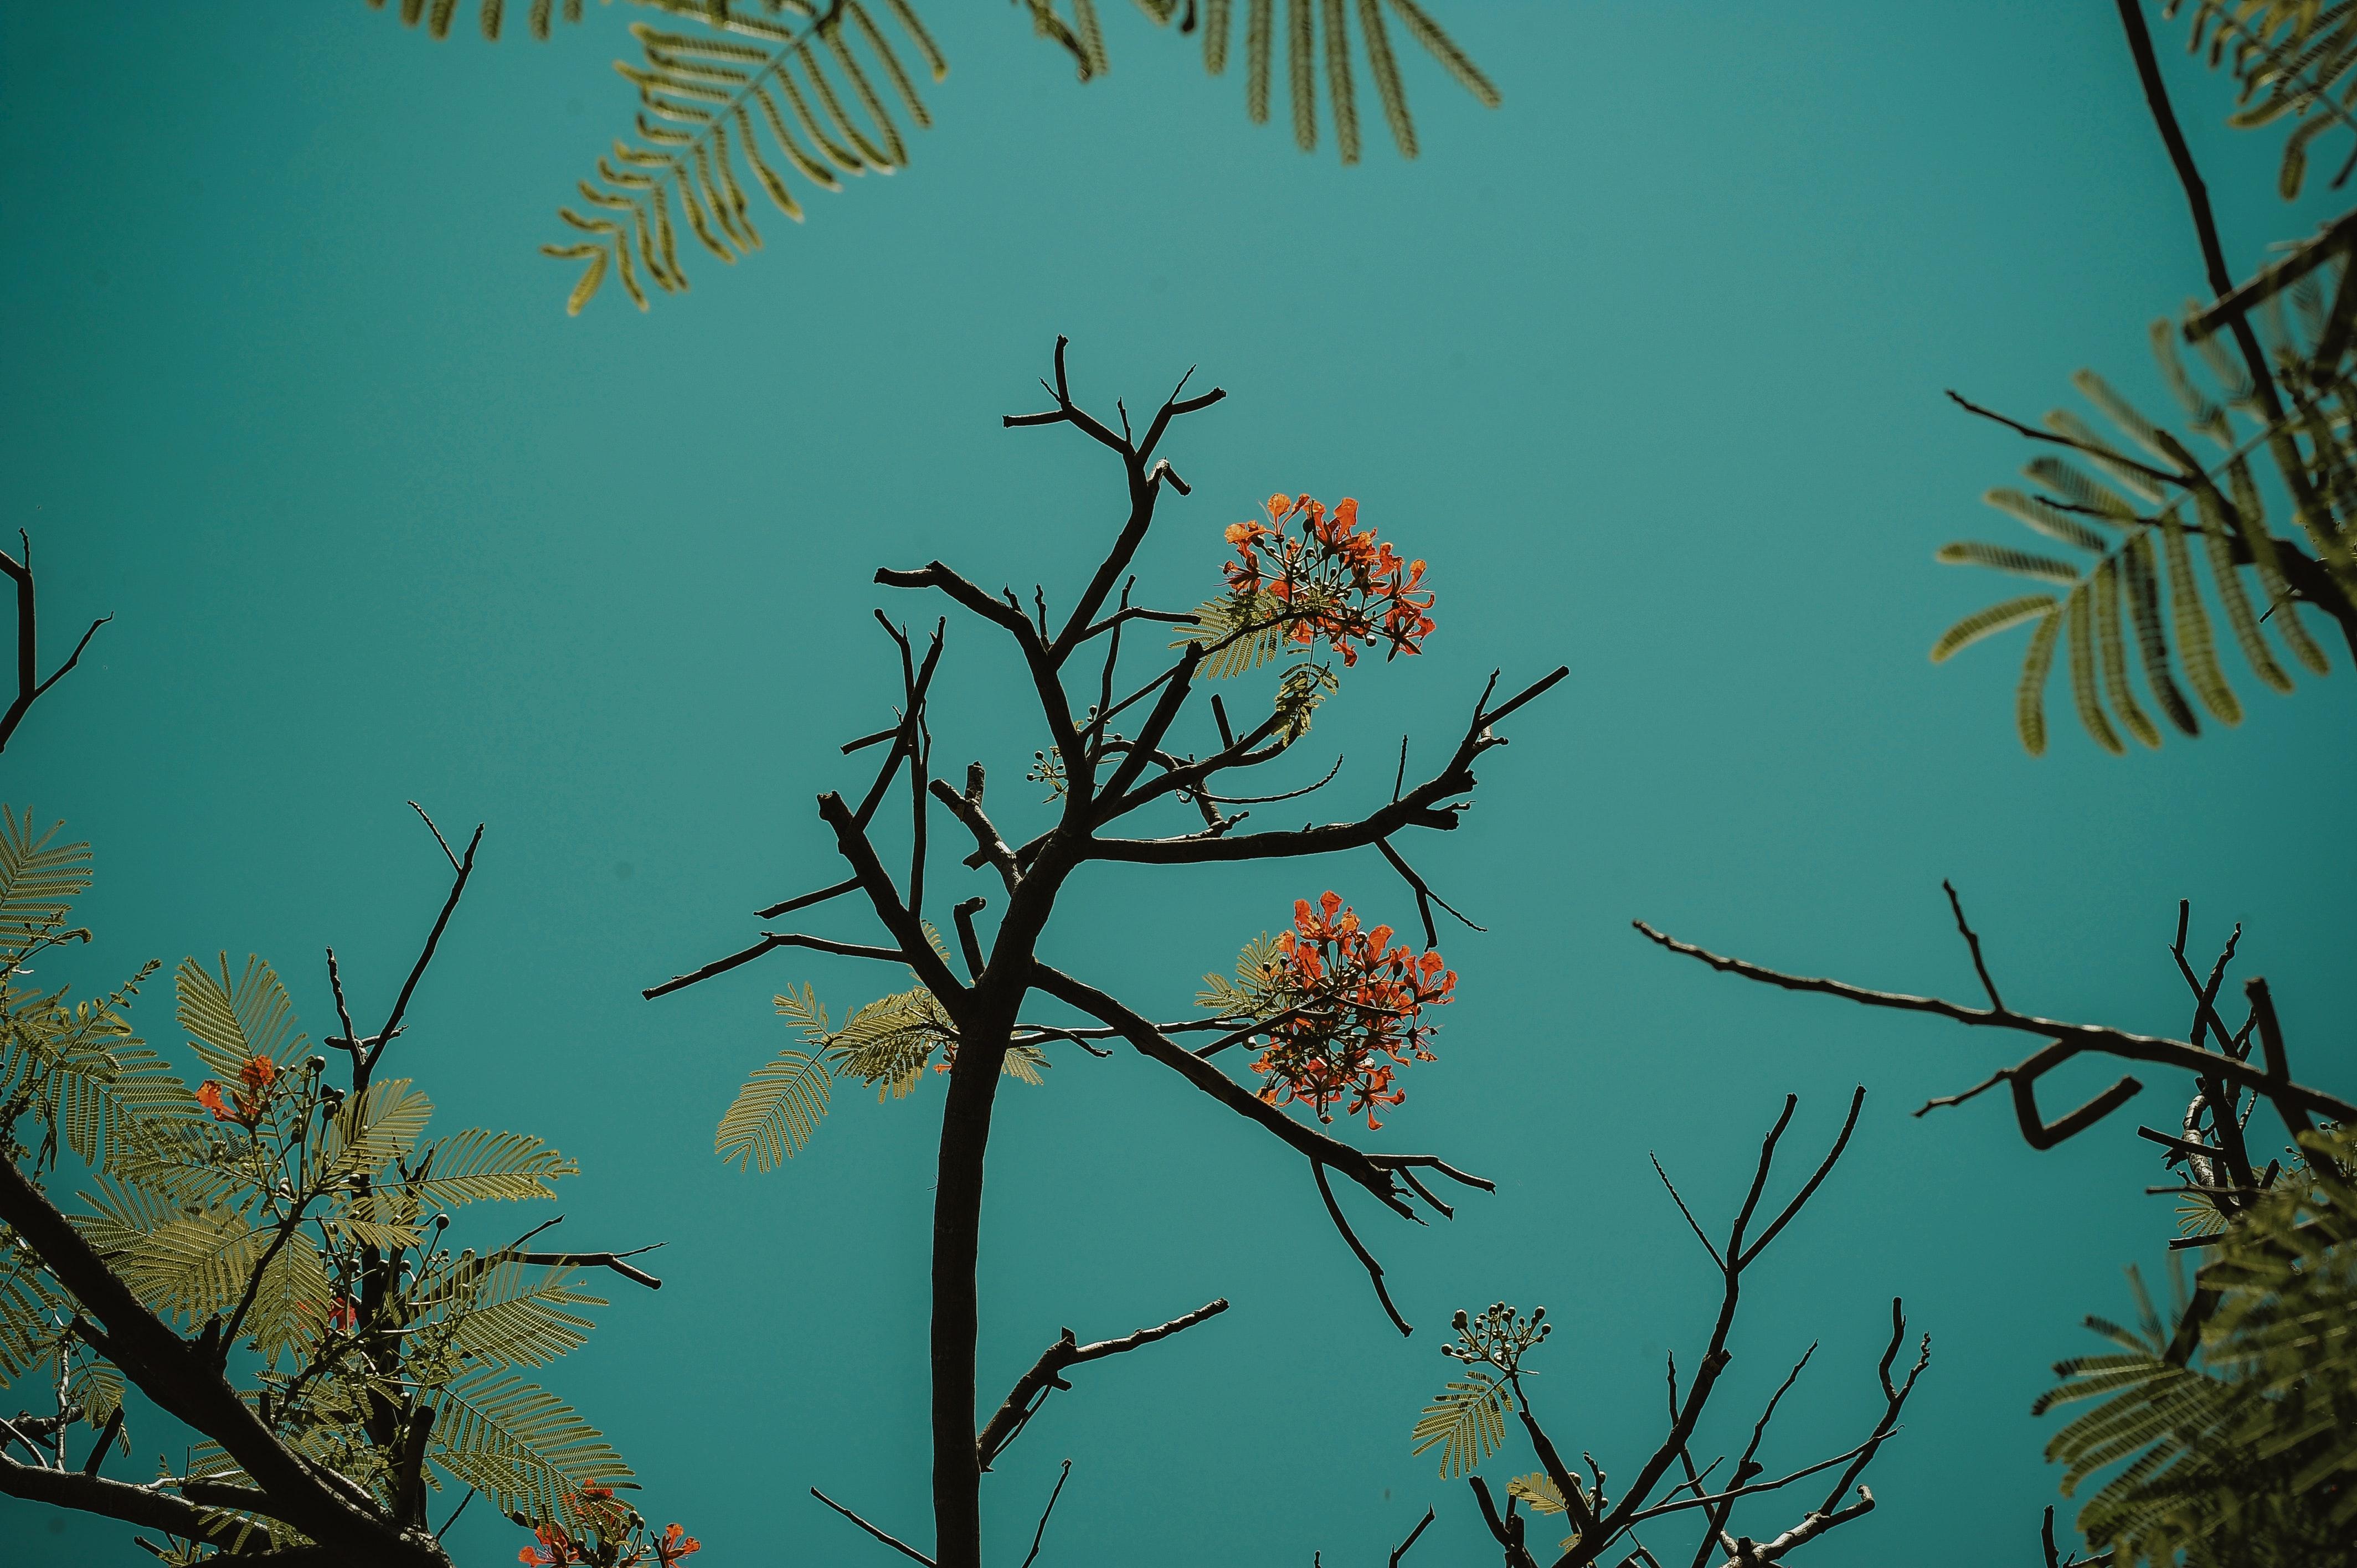 Red flowering tree photo